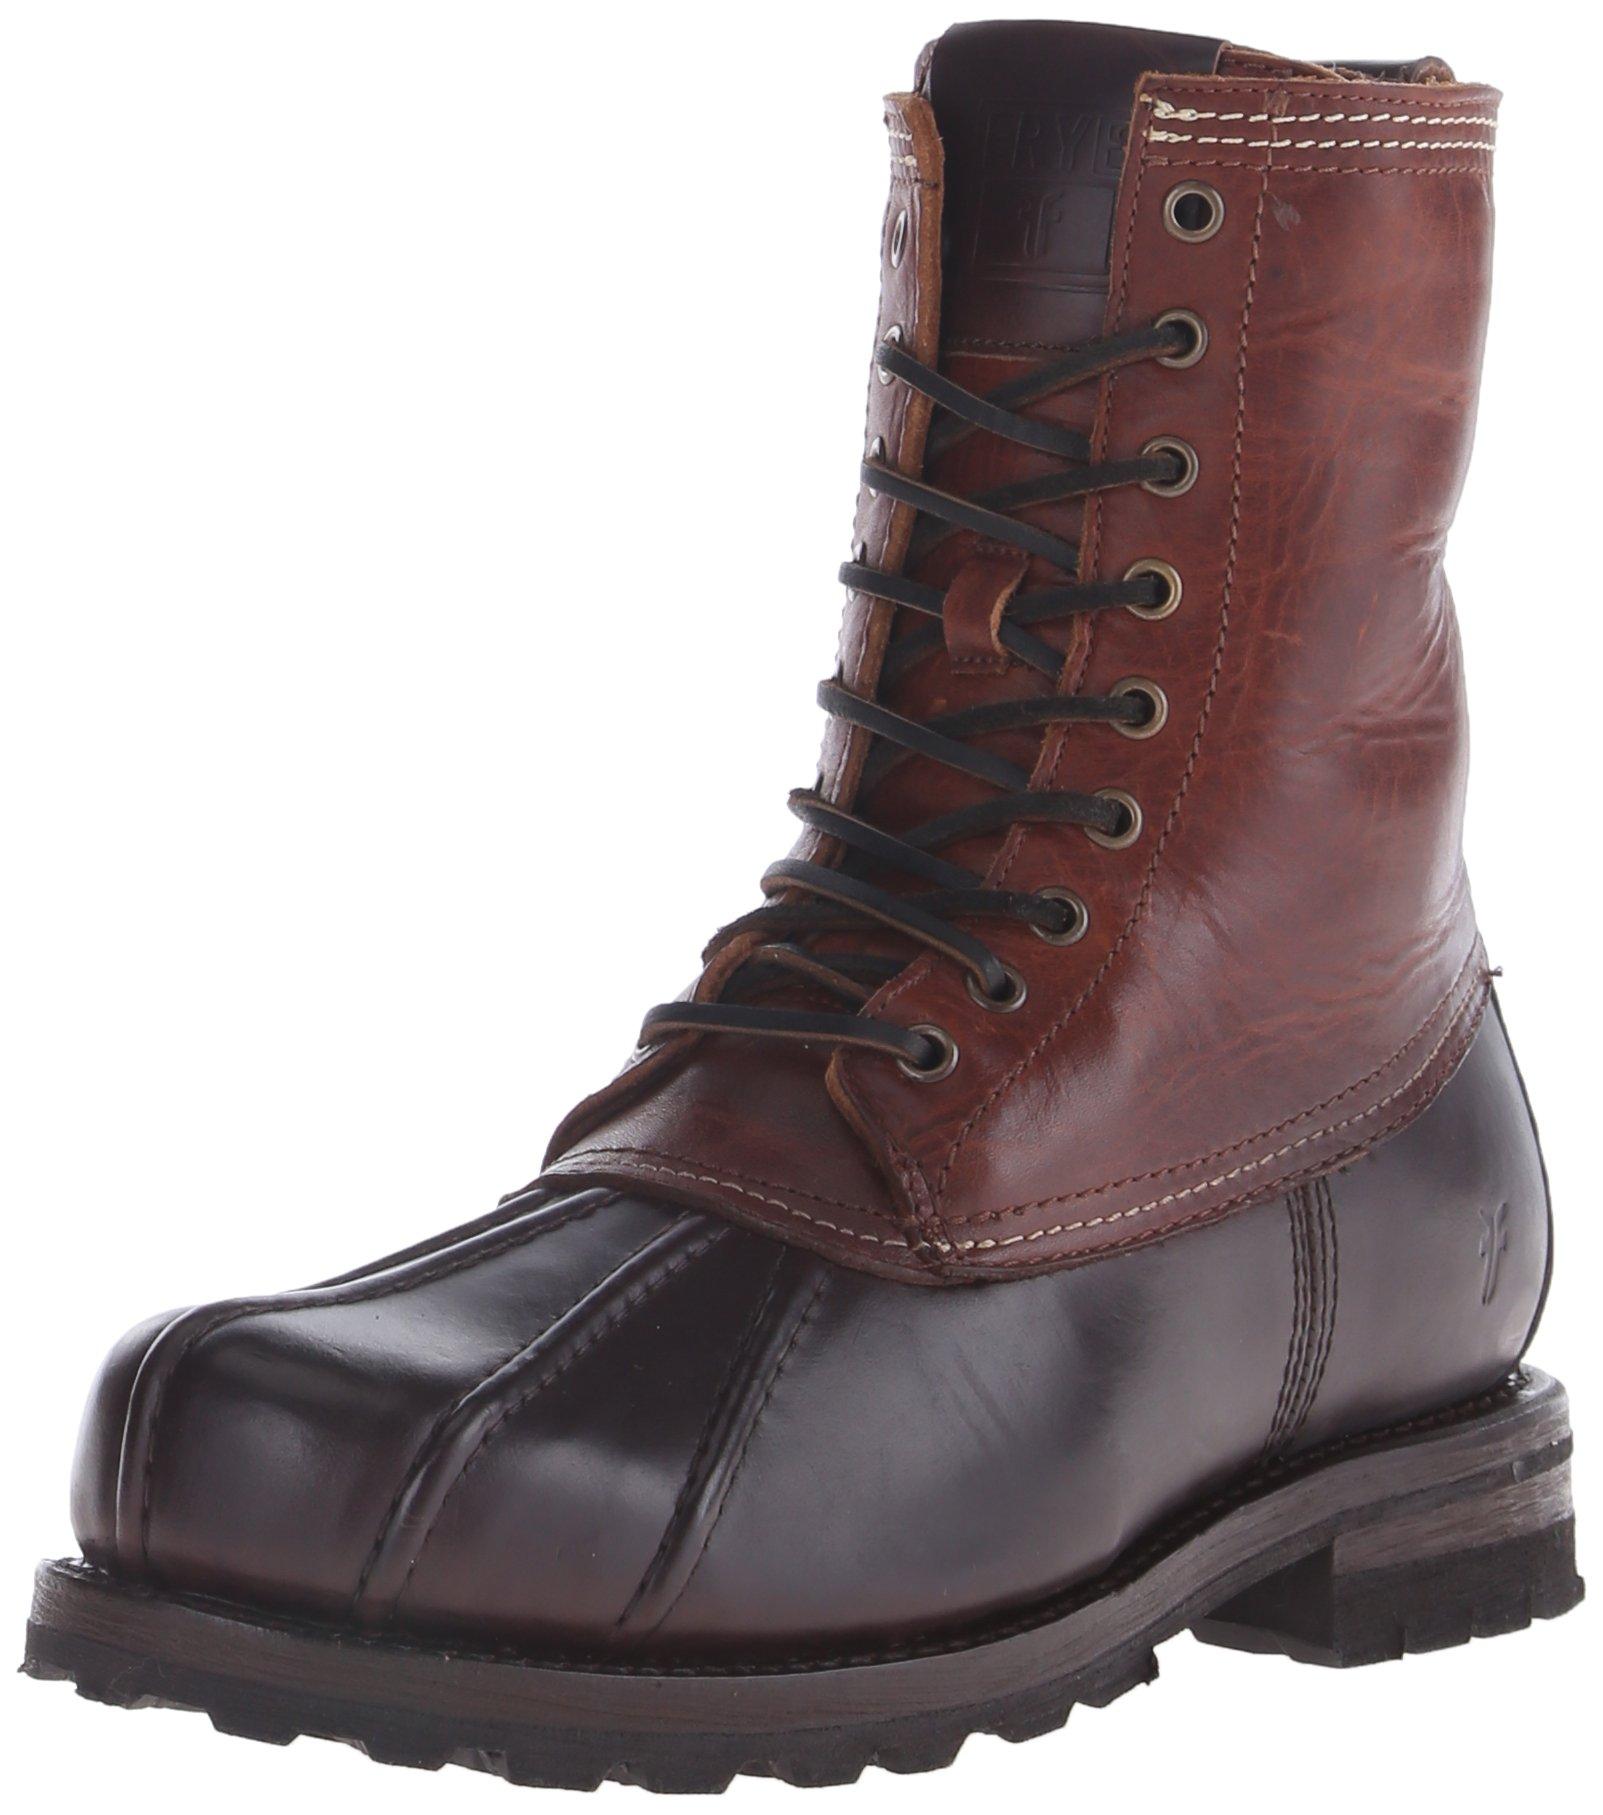 FRYE Men's Warren Duck Boot, Espresso/Multi, 10 M US